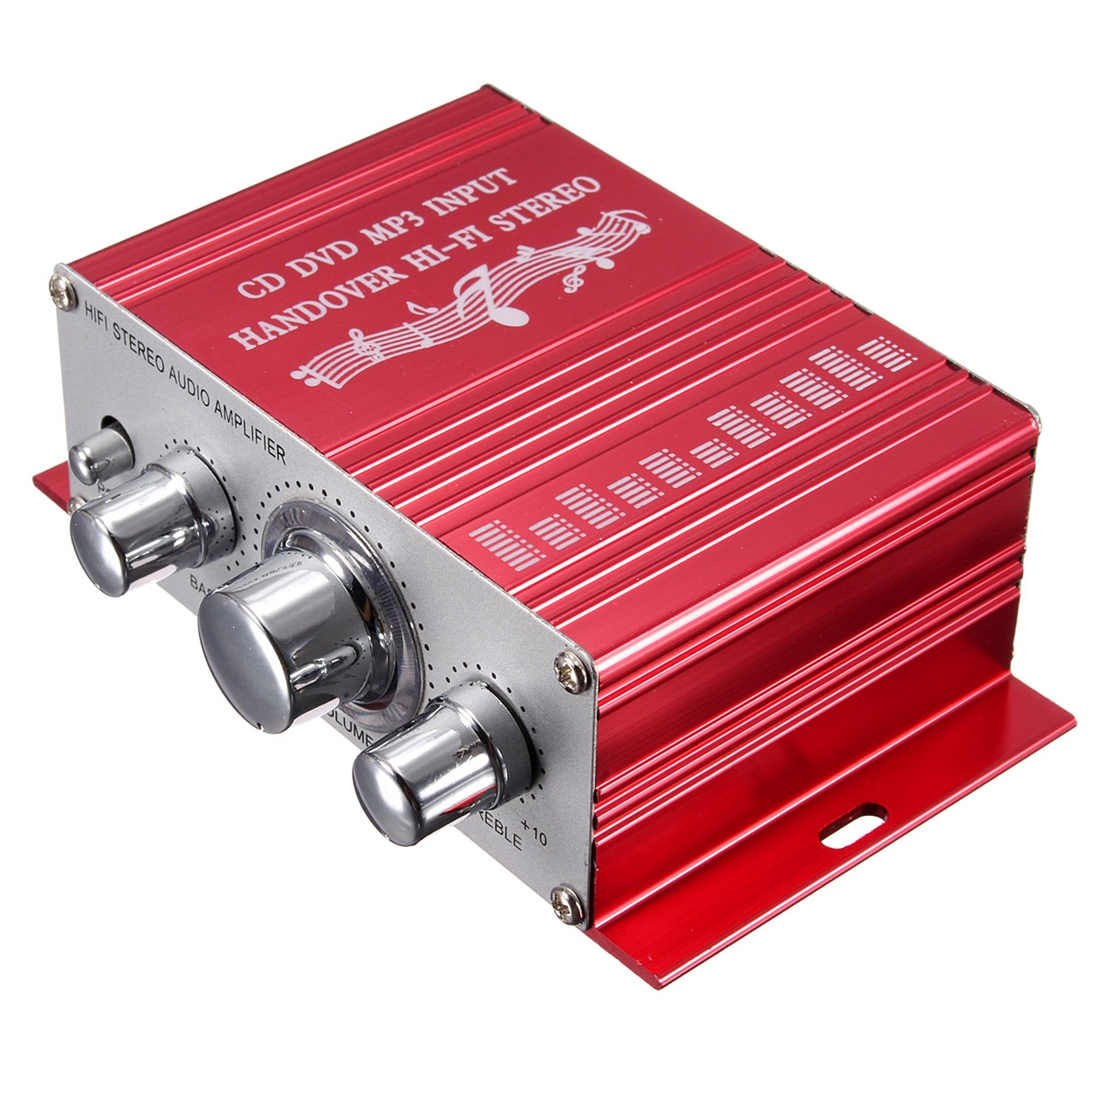 RCA 2CH Hi-Fi סטריאו מגבר Booster MP3 רמקול לרכב DVD מיני Moto